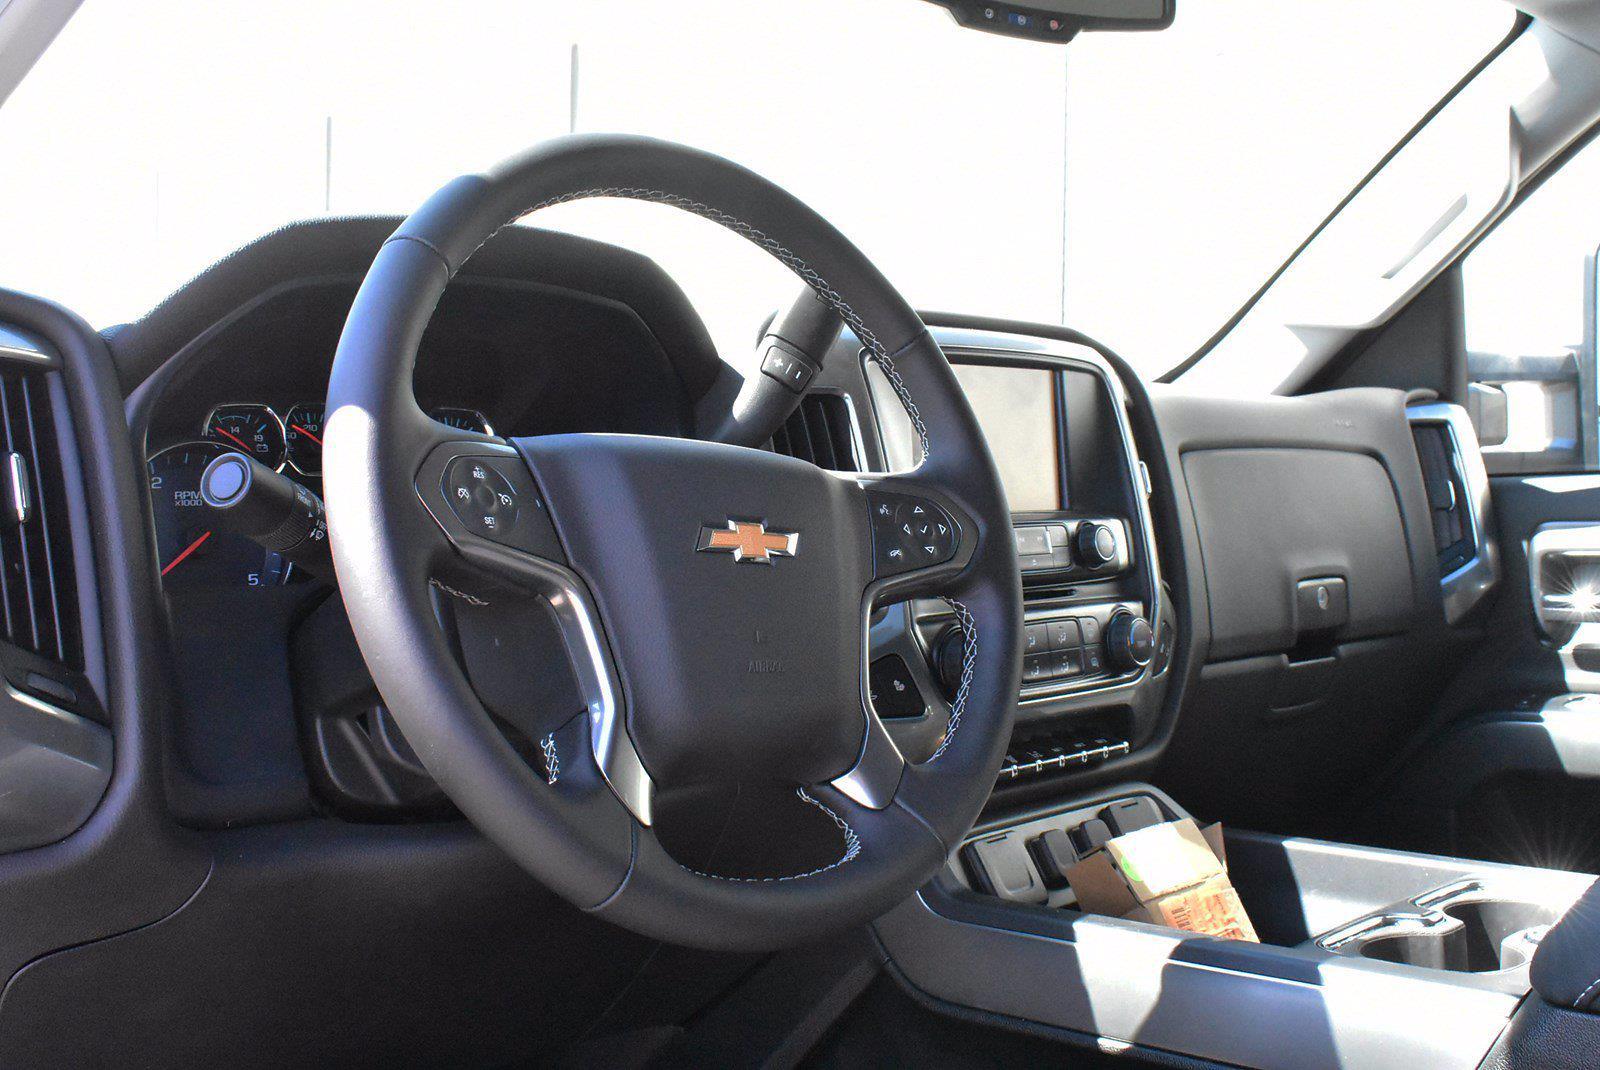 2020 Chevrolet Silverado 5500 DRW 4x2, Cab Chassis #D100225 - photo 4